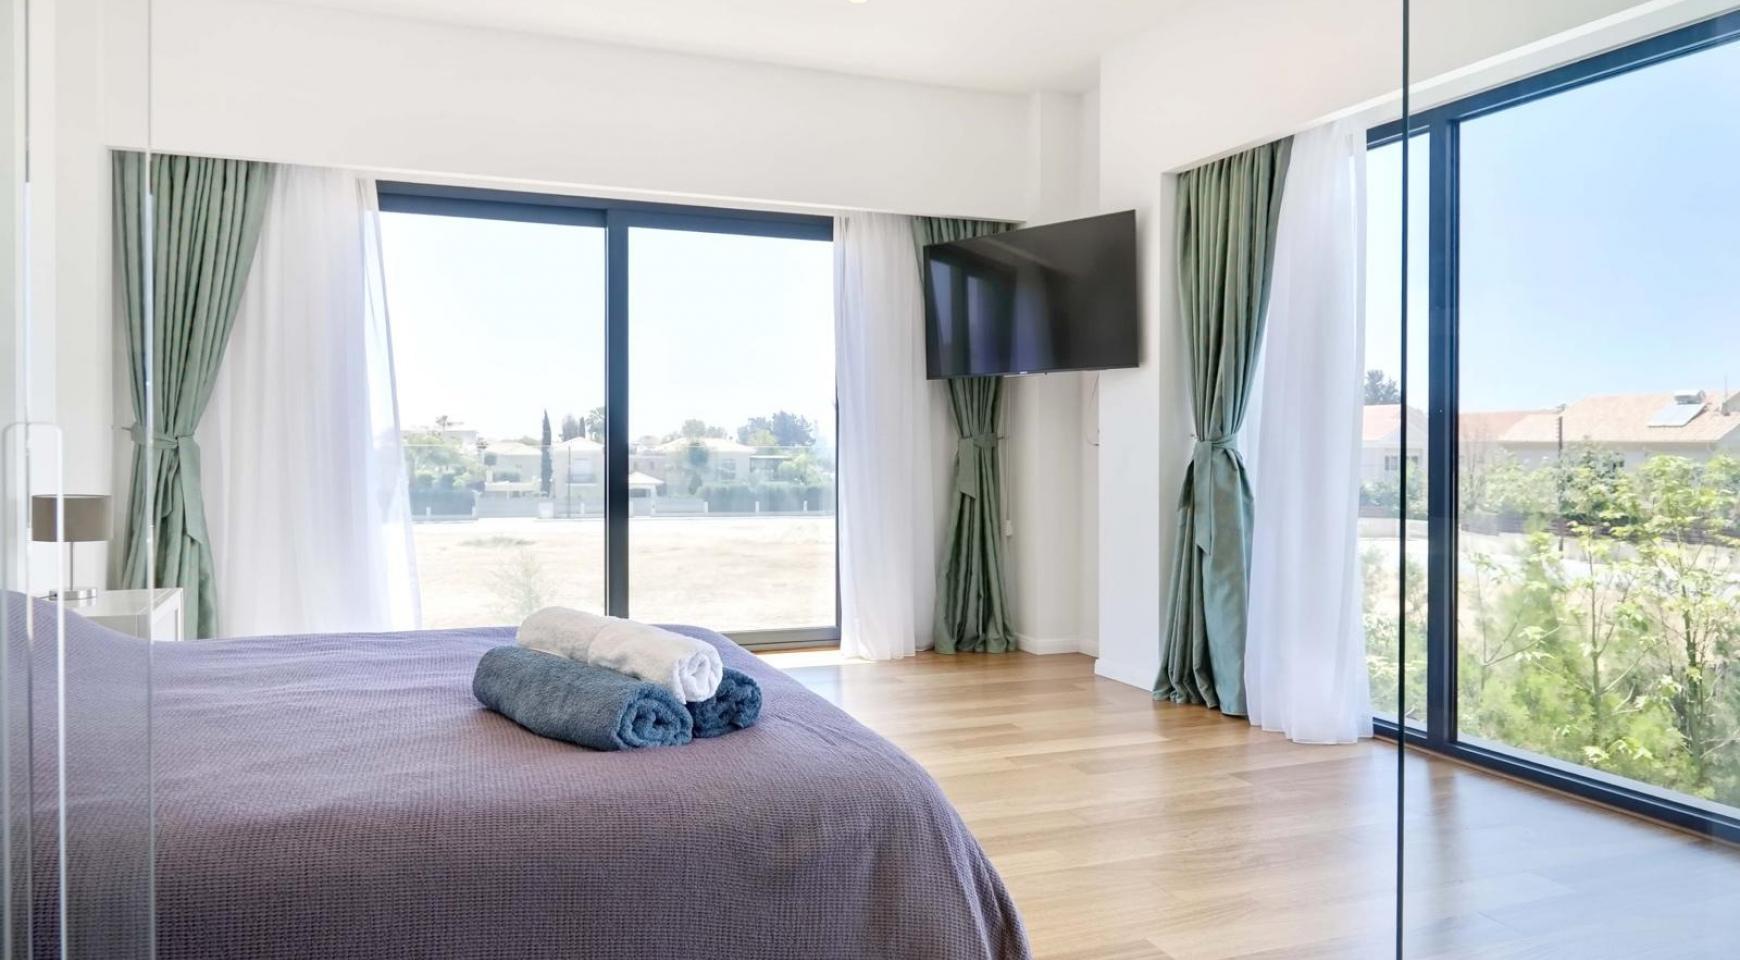 New Luxurious 4 Bedroom Villa in the Tourist Area - 33